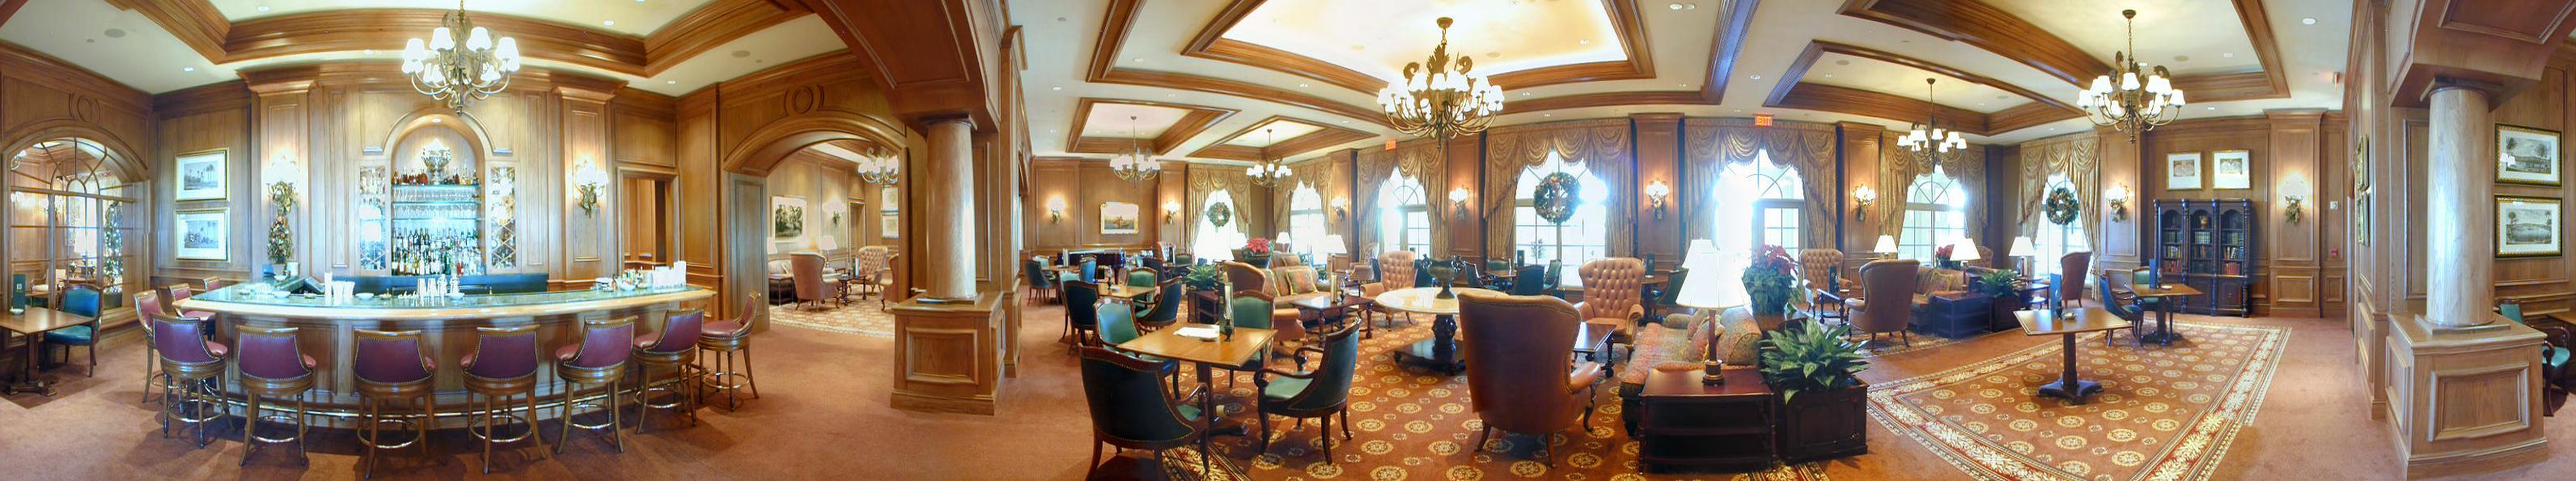 The Ritz Carlton, Sarasota. 1111 Ritz Carlton Dr, Sarasota, FL 34236 ritzcarlton.com (941) 309-2000